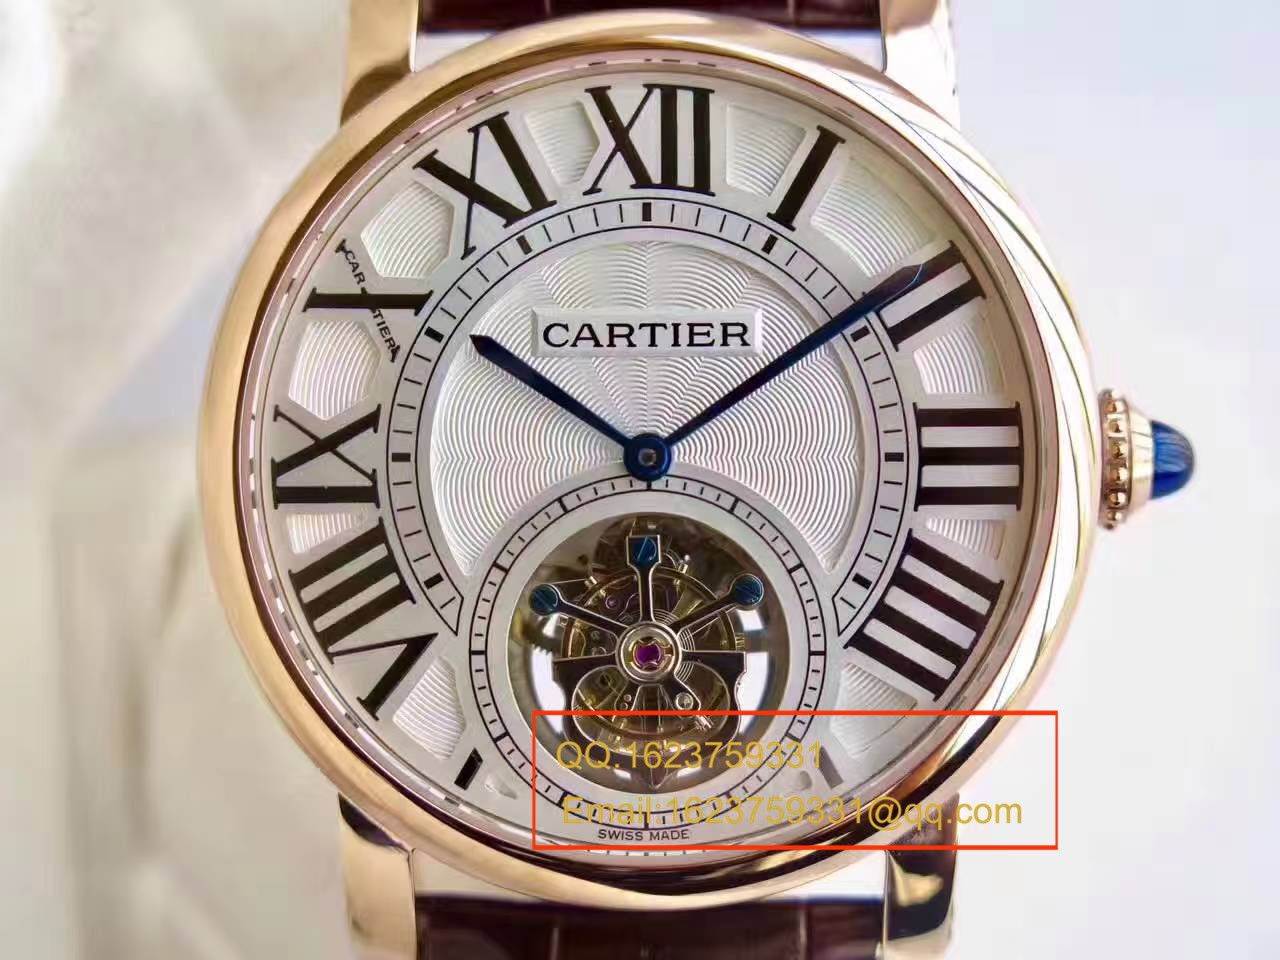 【BL厂一比一高仿手表】卡地亚ROTONDE DE CARTIER系列W1556215陀飞轮腕表 / KCI115